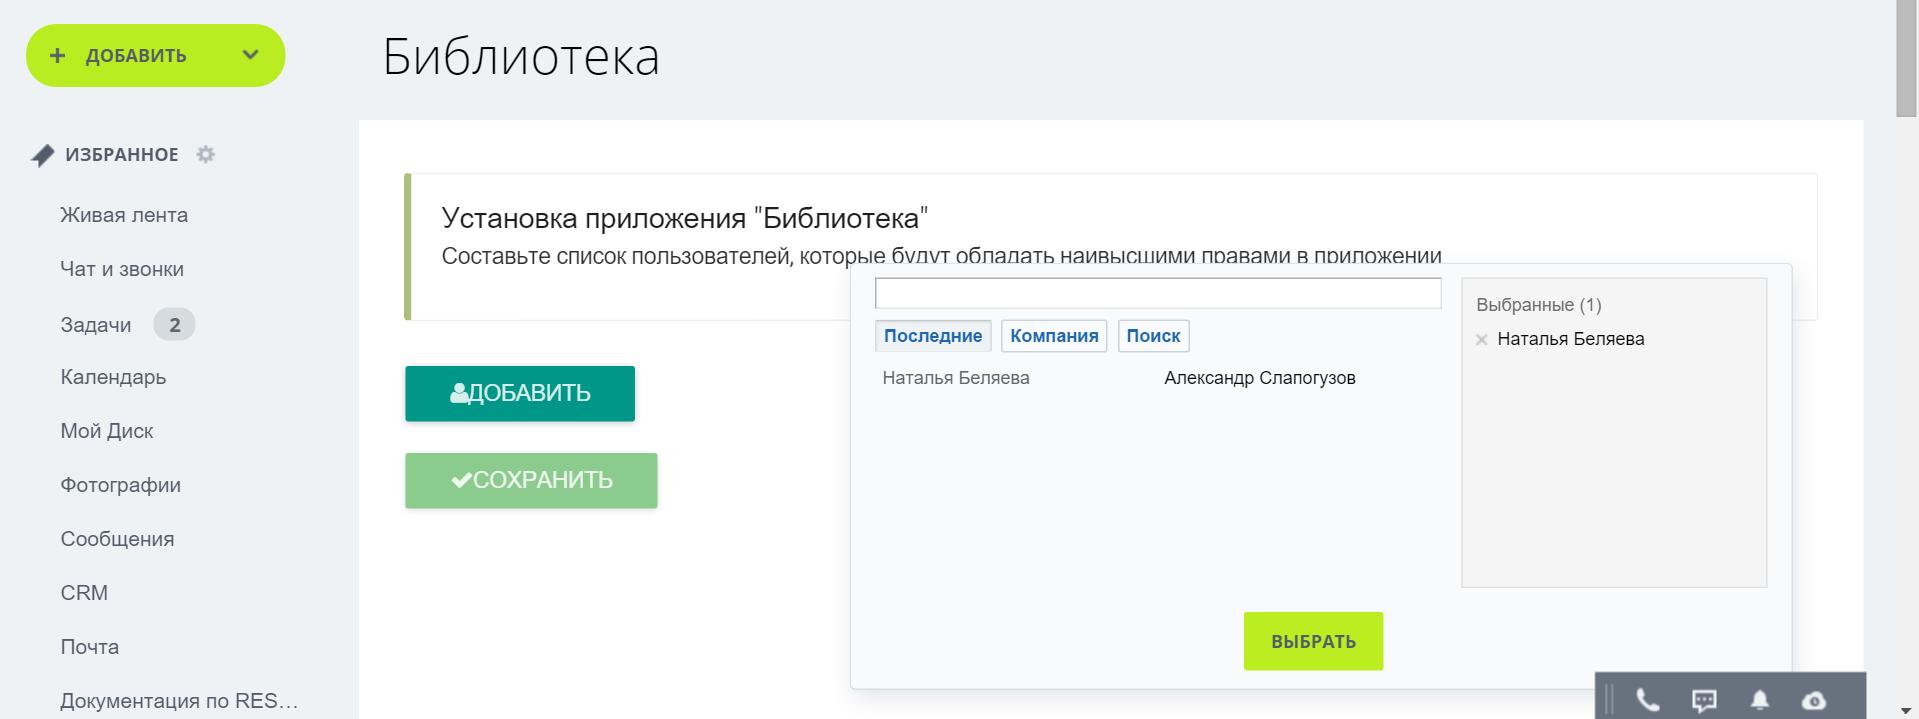 Модуль Библиотека для Битрикс24 - настройка прав администратора